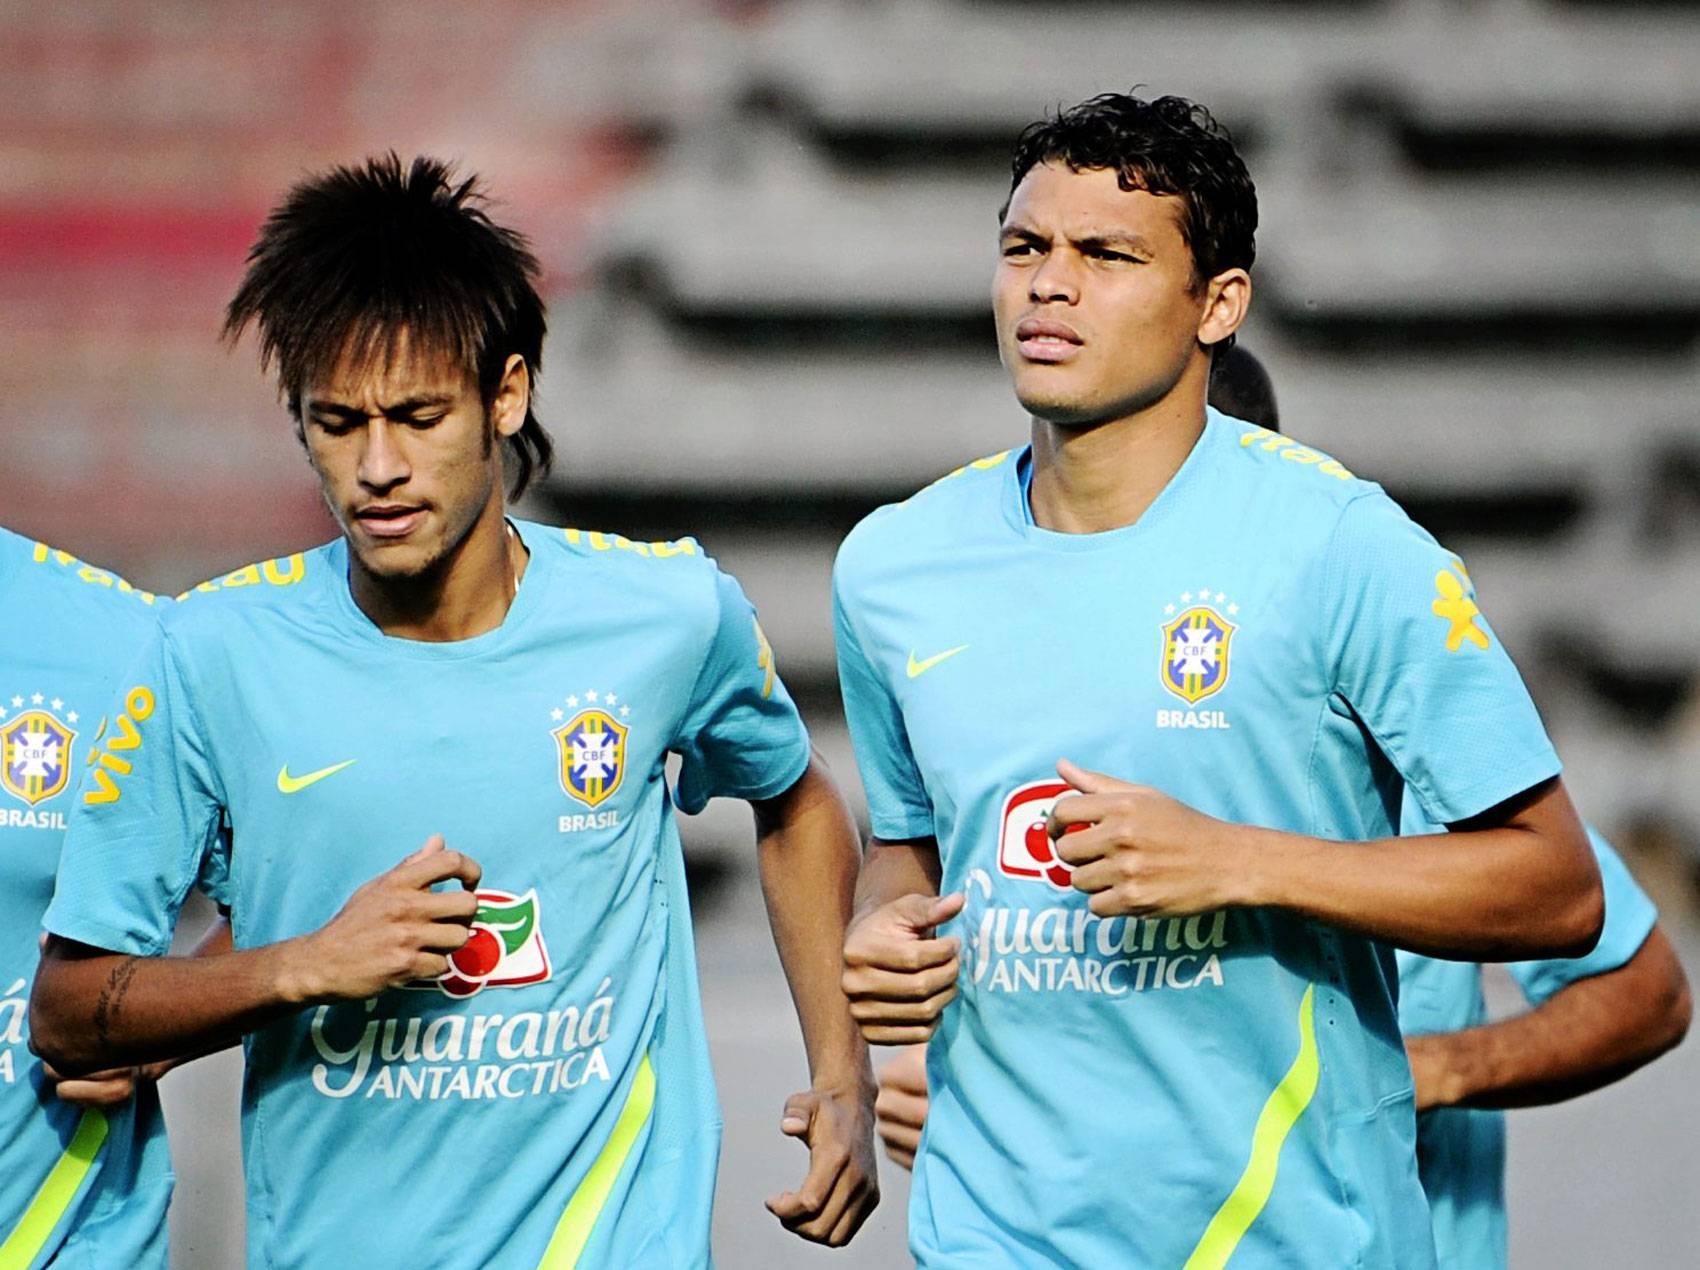 Le stelle del Brasile: Neymar e Thiago Silva